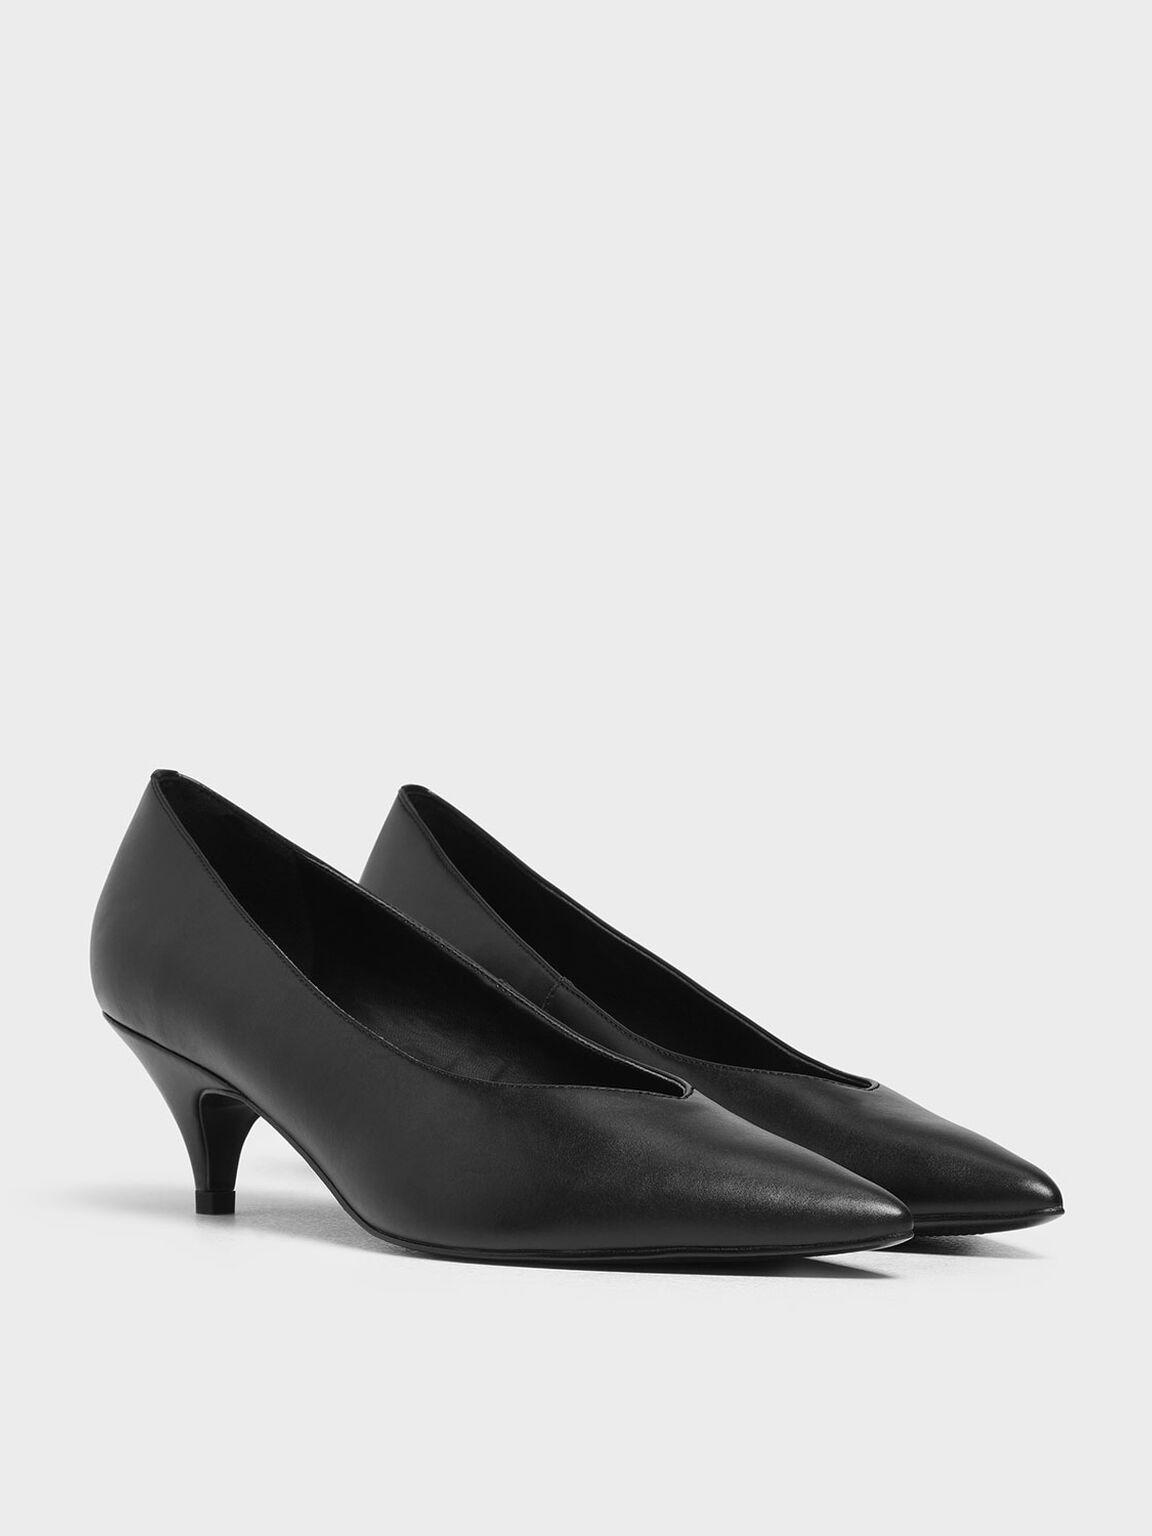 Pointed Toe Kitten Heel Pumps, Black, hi-res